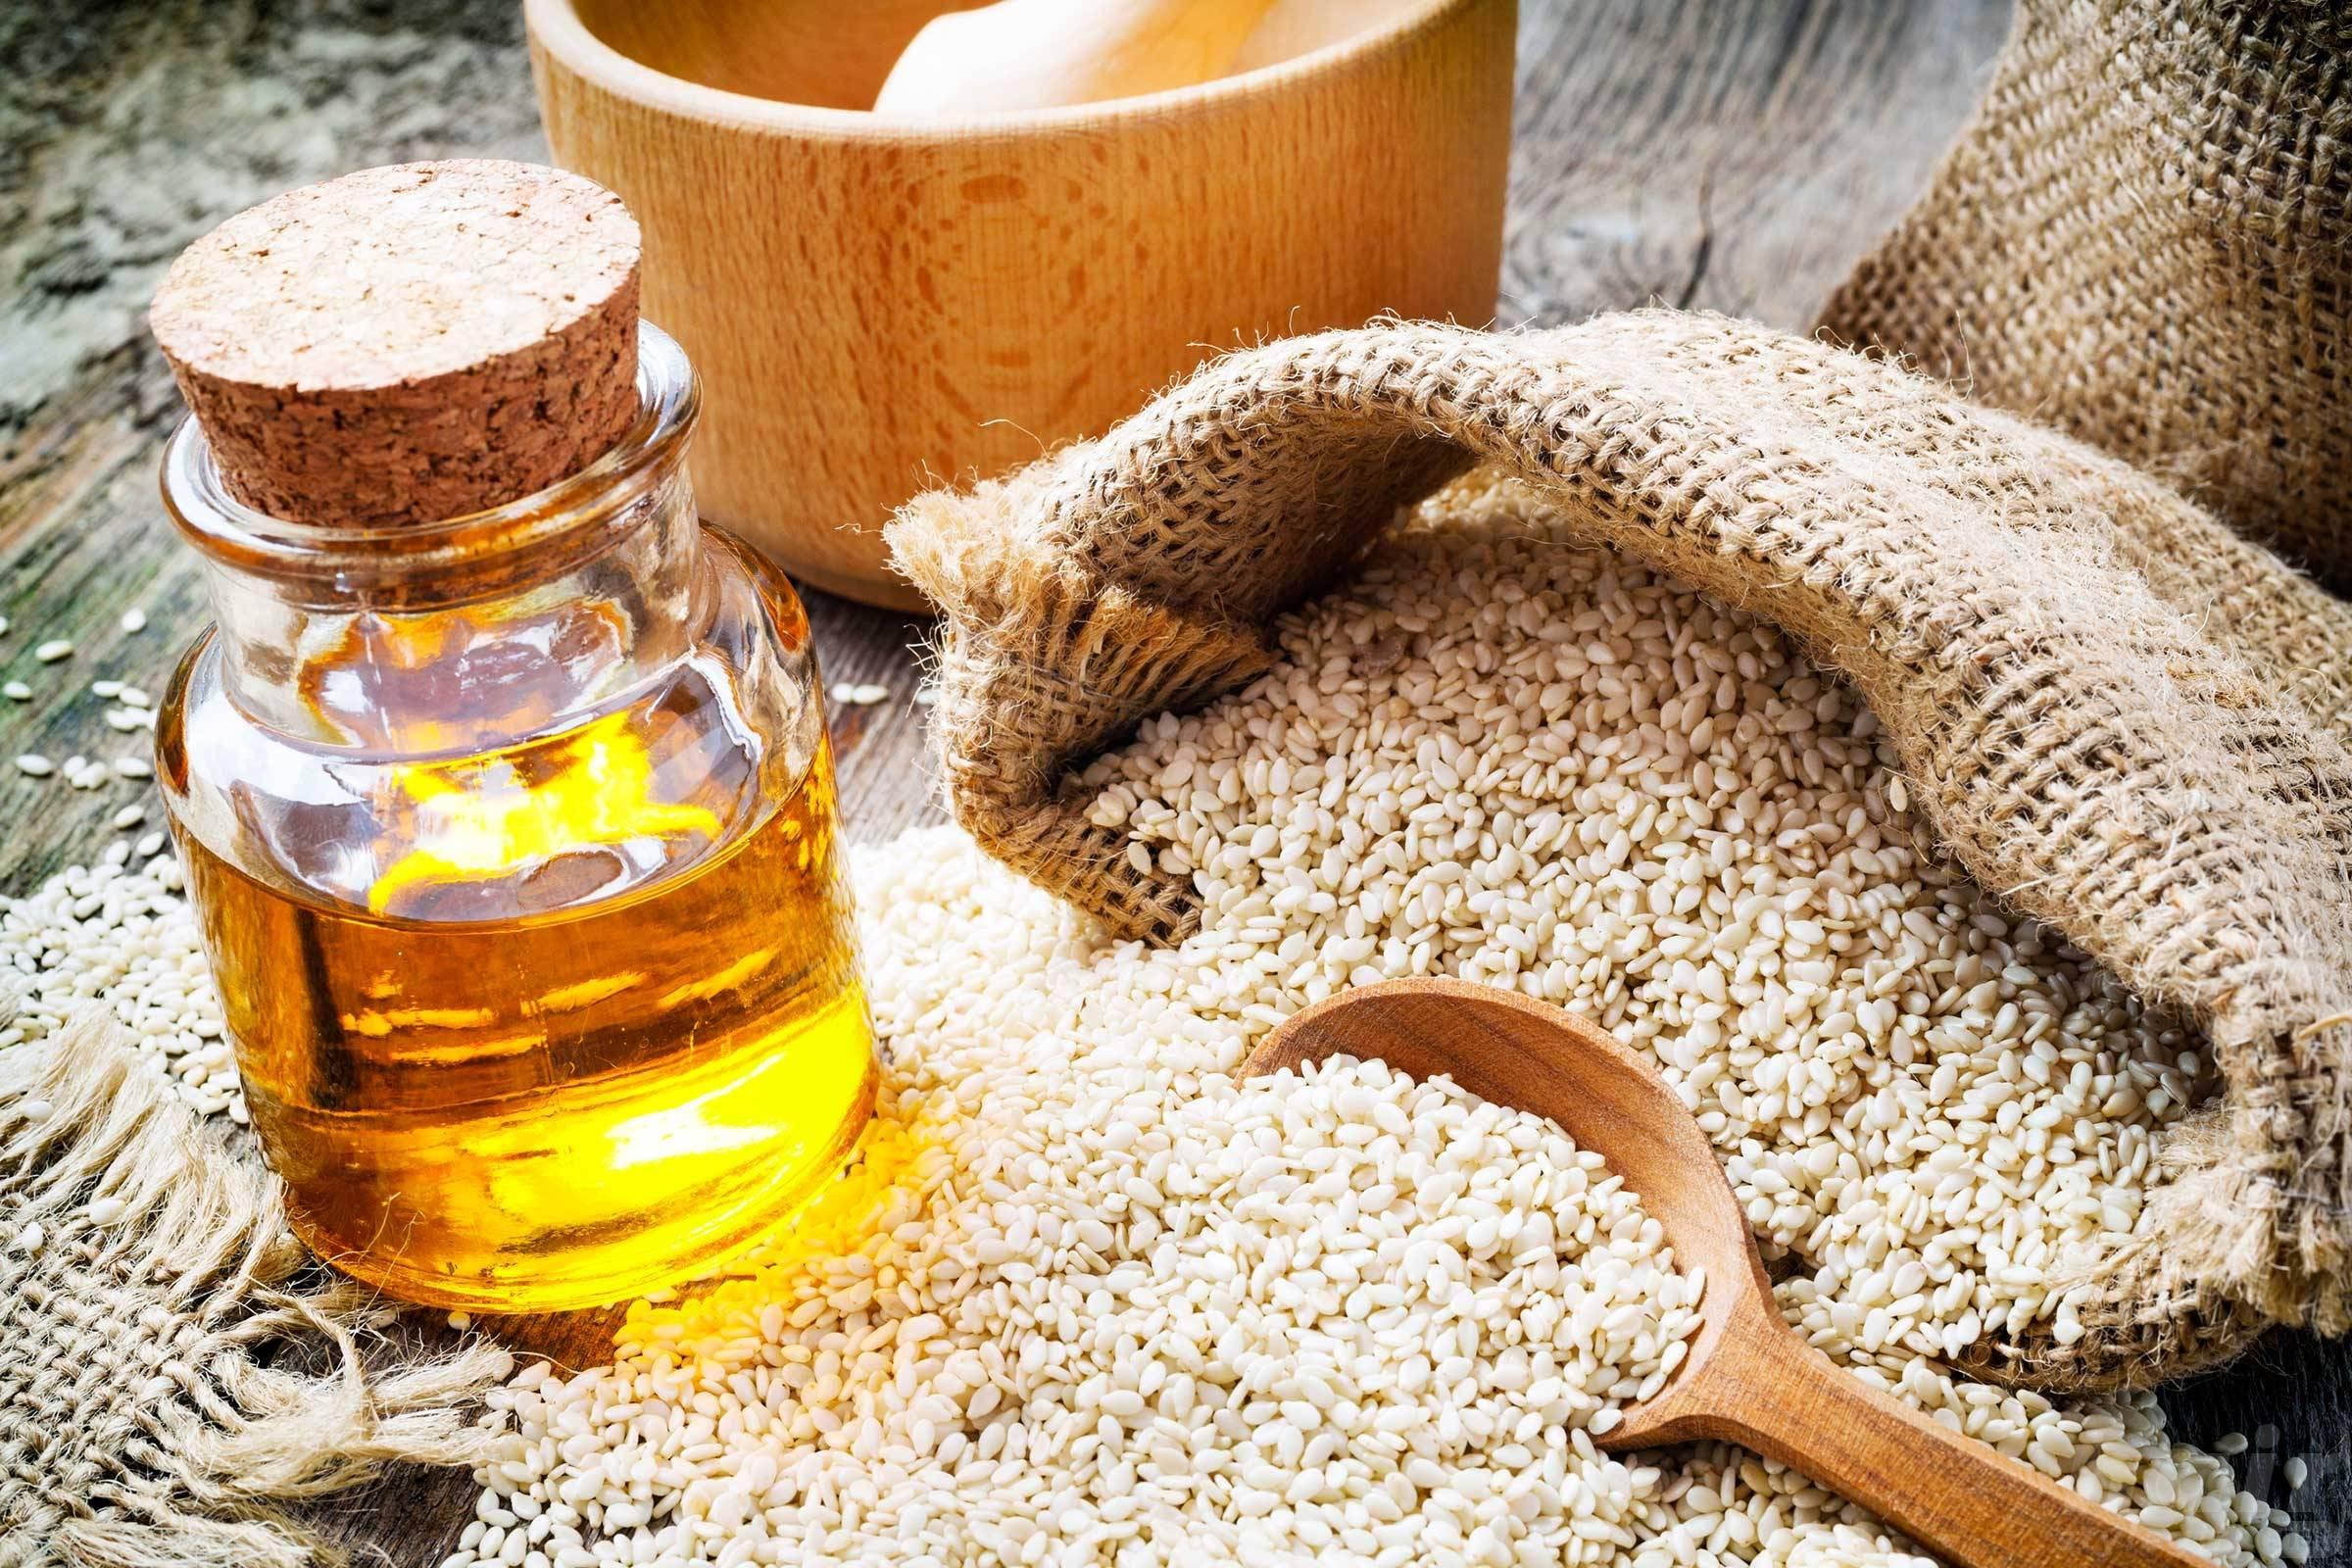 Sesame Oil for Hair Growth